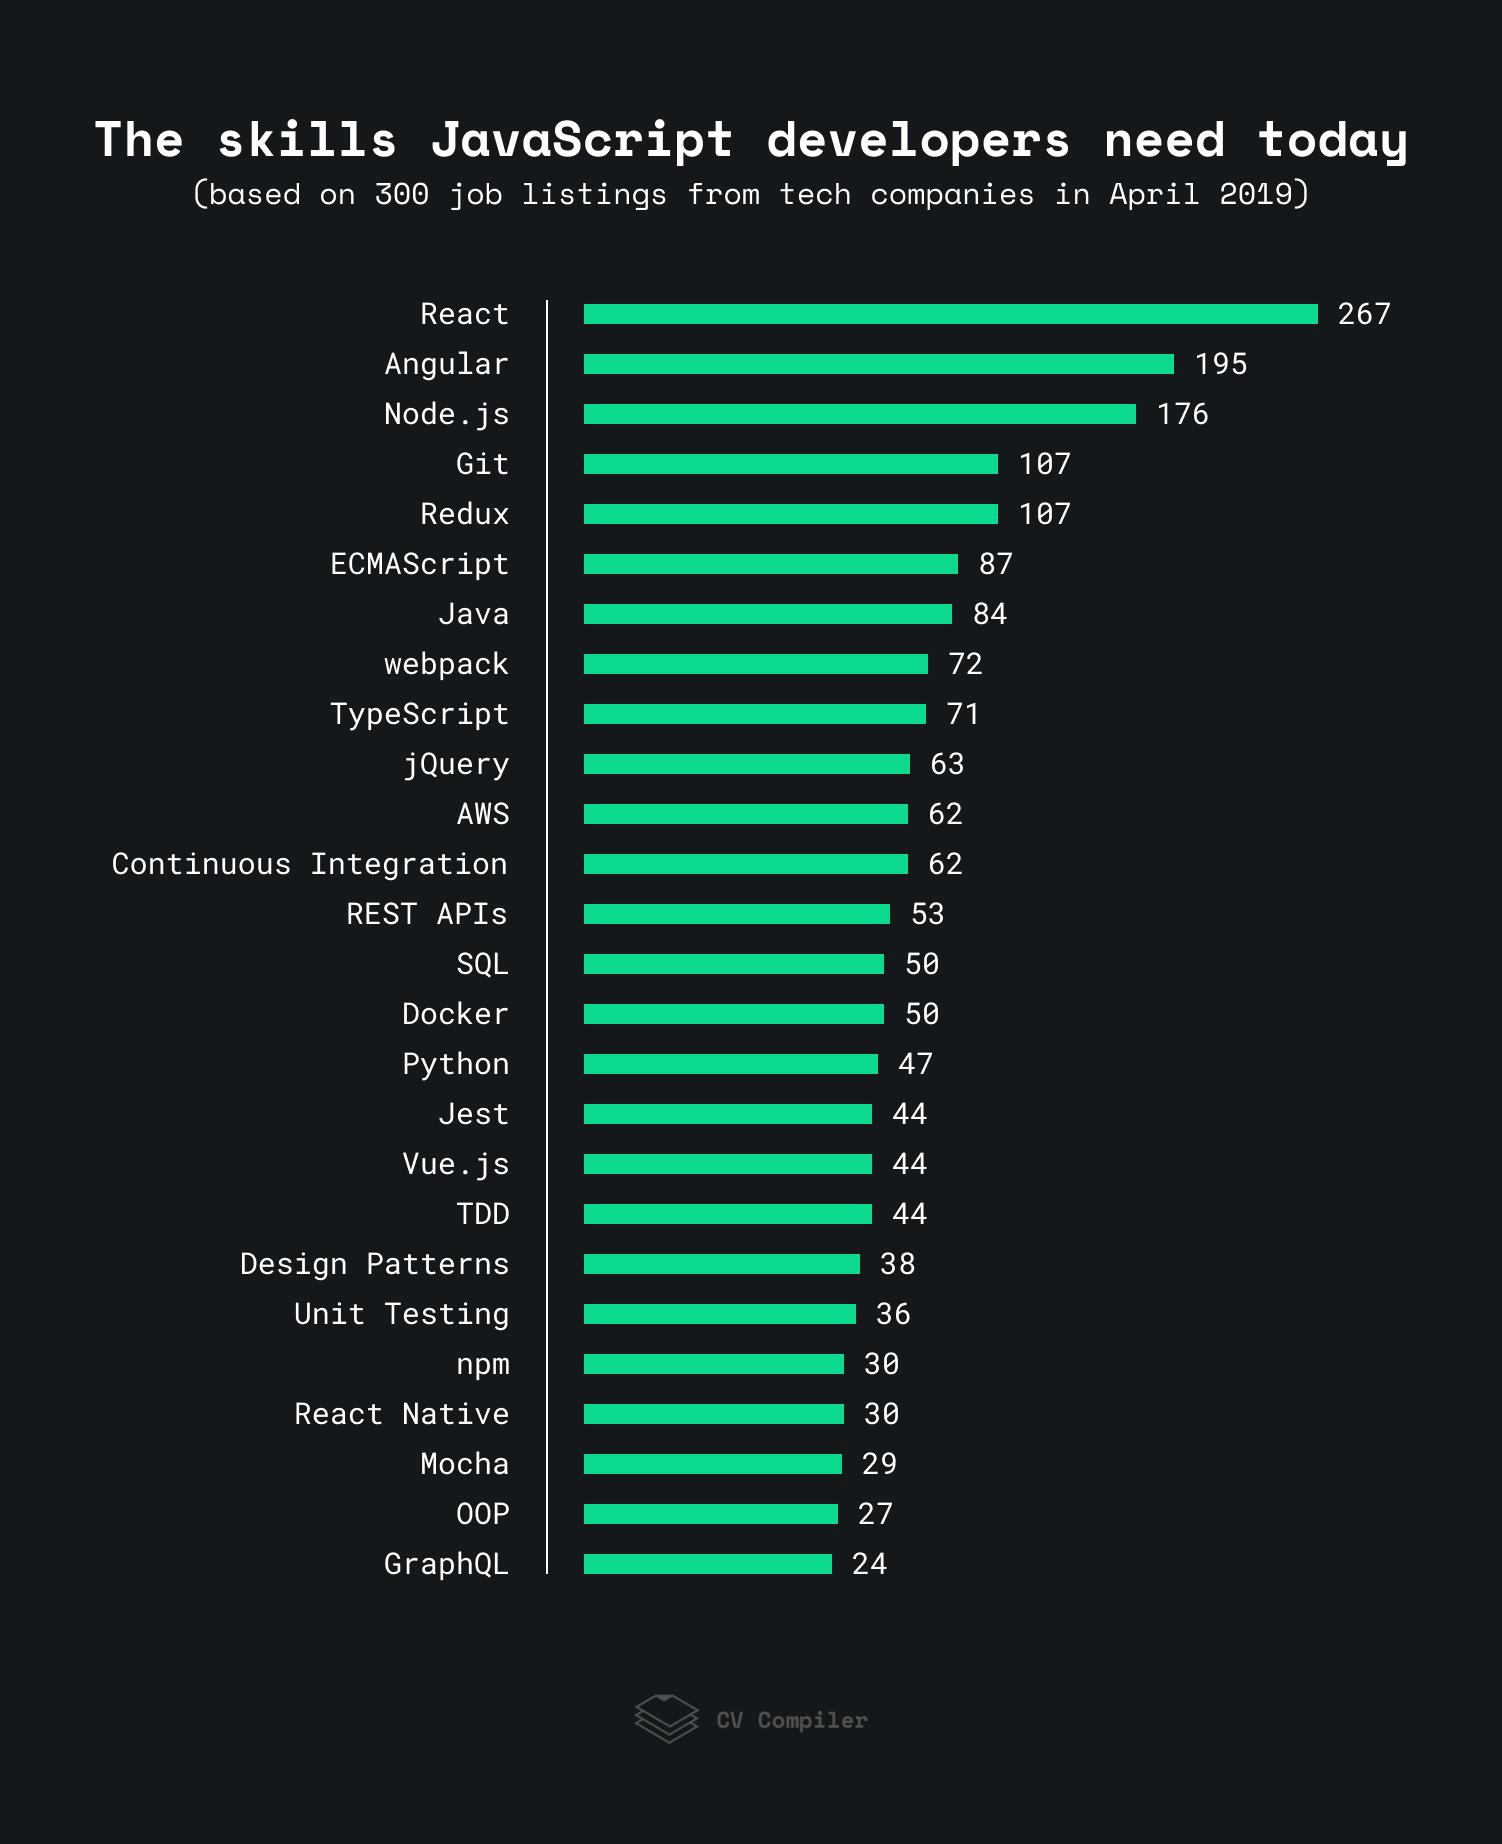 JavaScript Development Skills